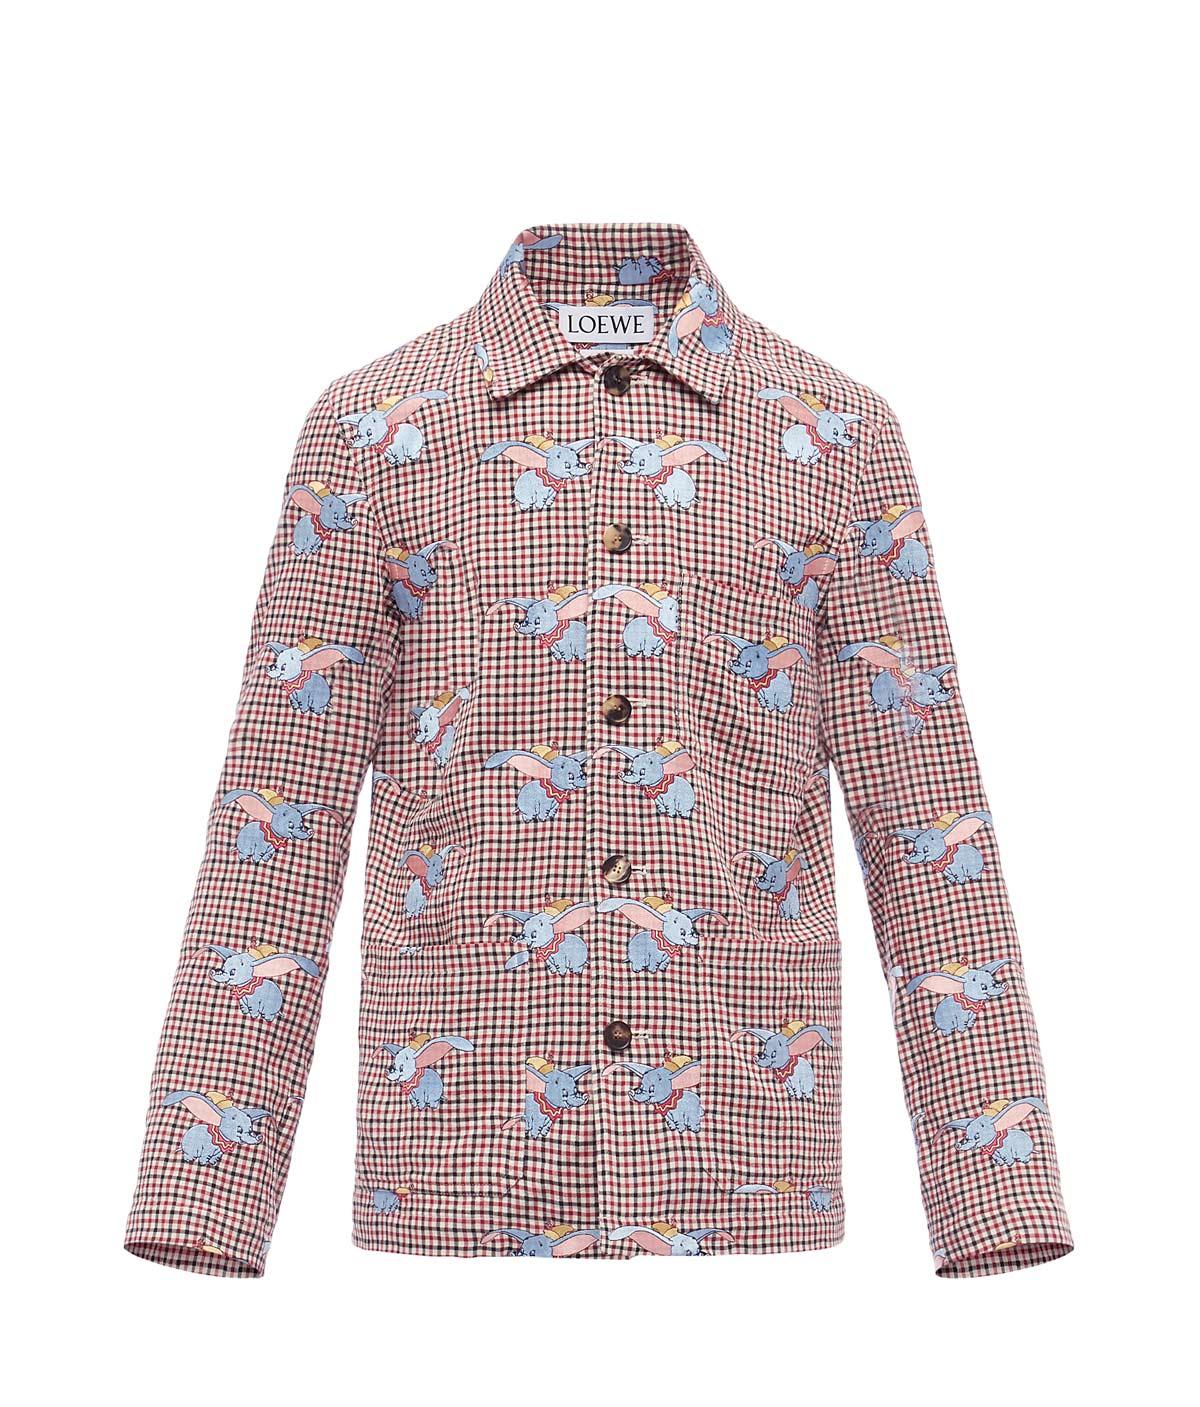 Loewe Jacket Dumbo Multicolor, HKD 42,700